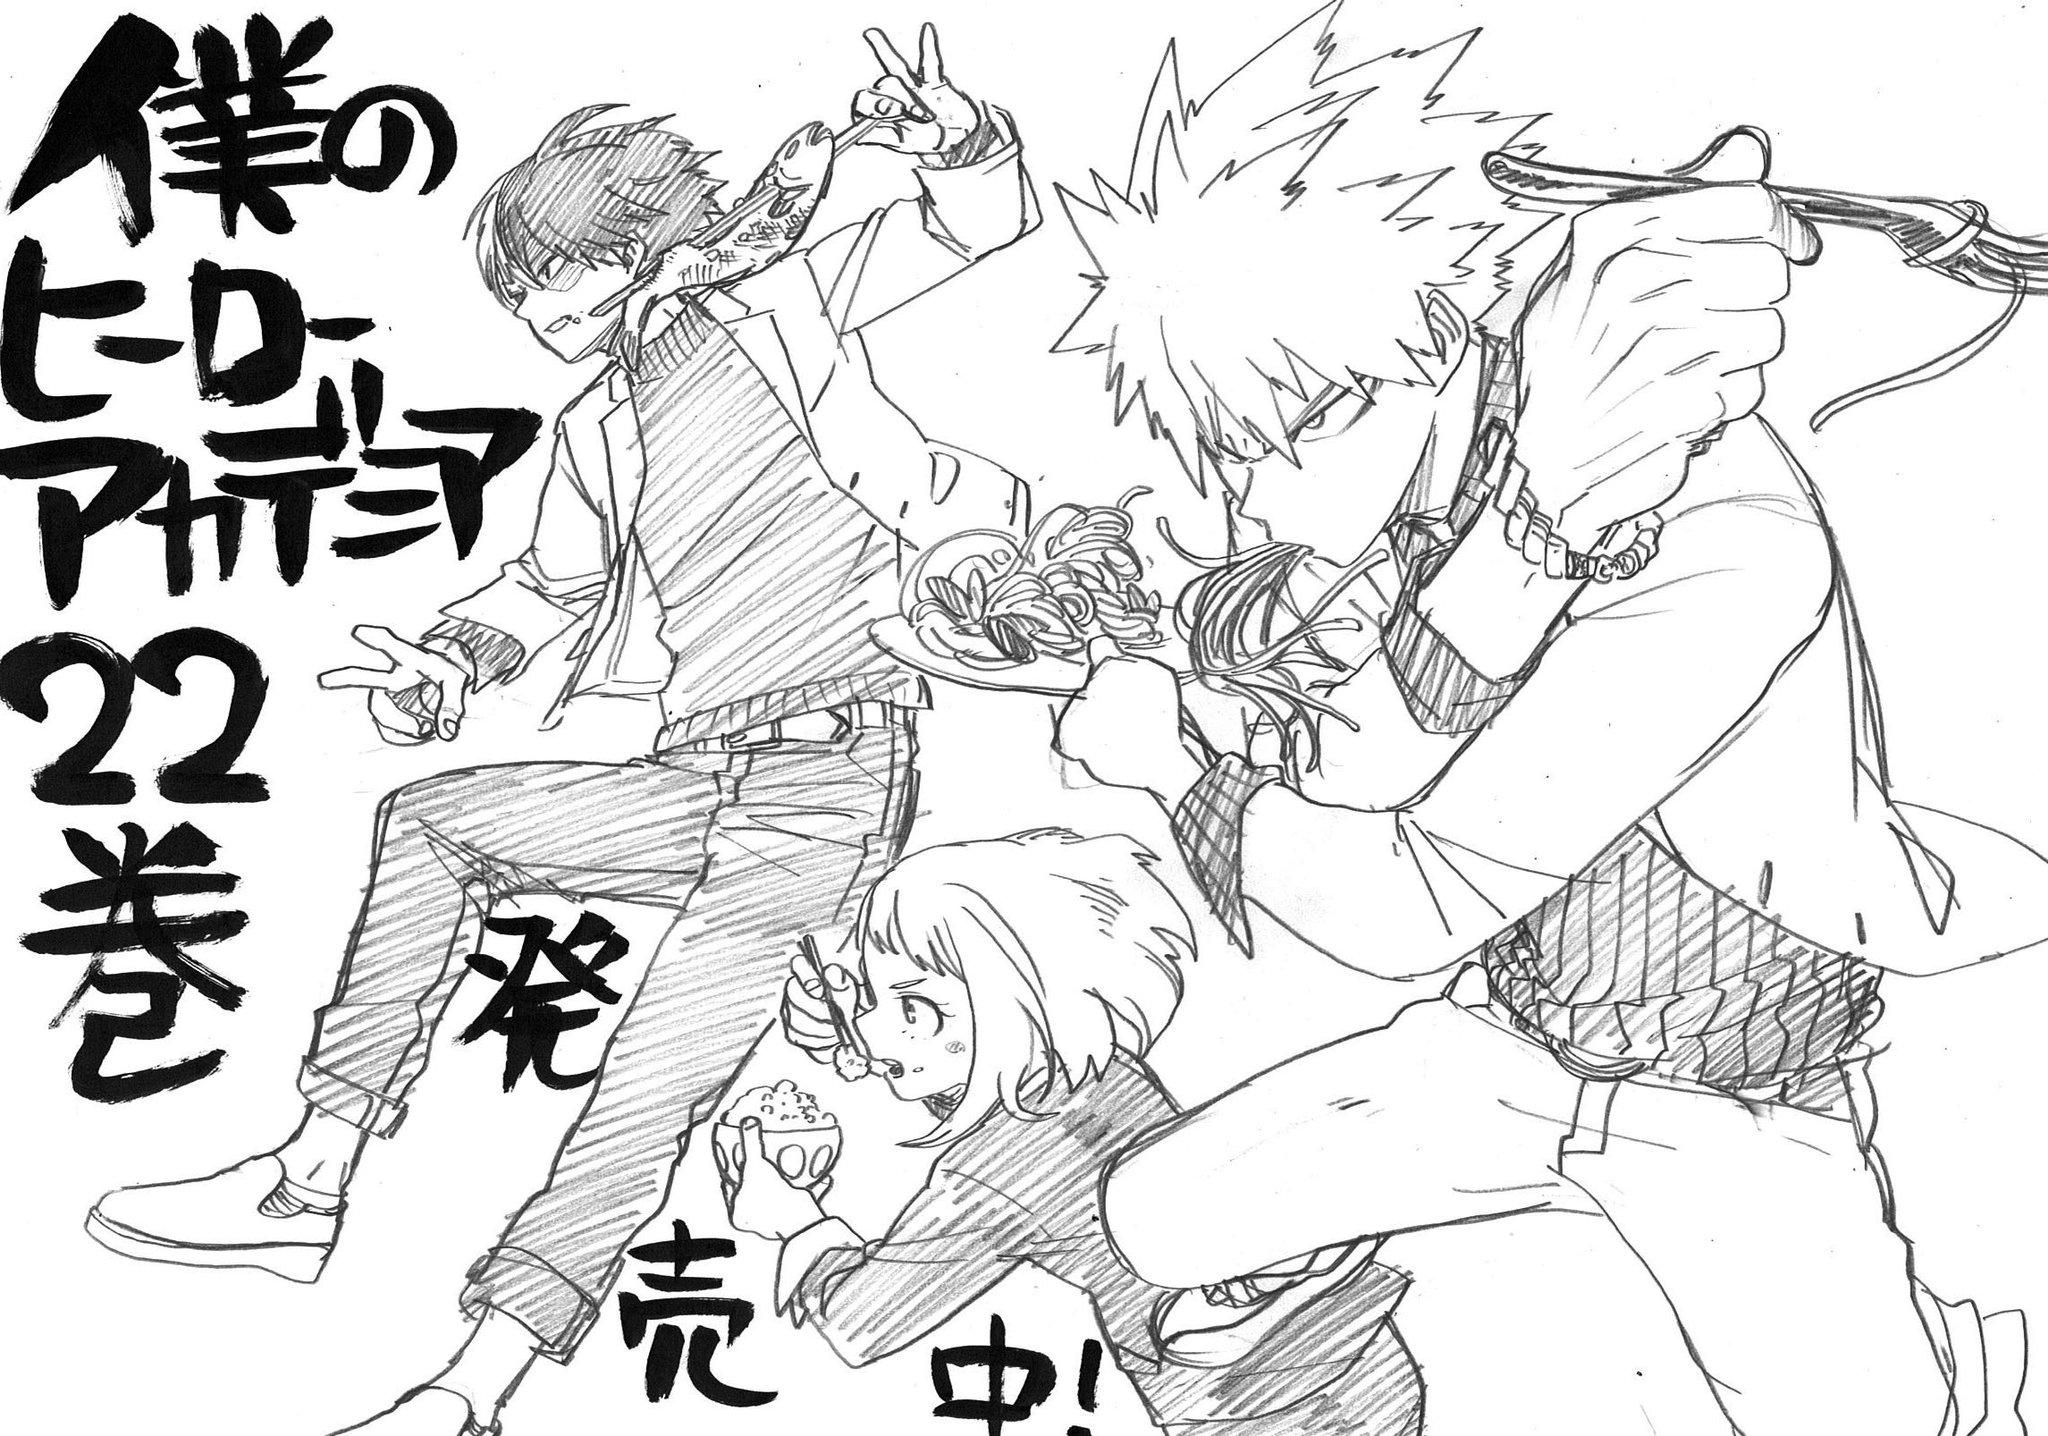 Volume 22 Sketch